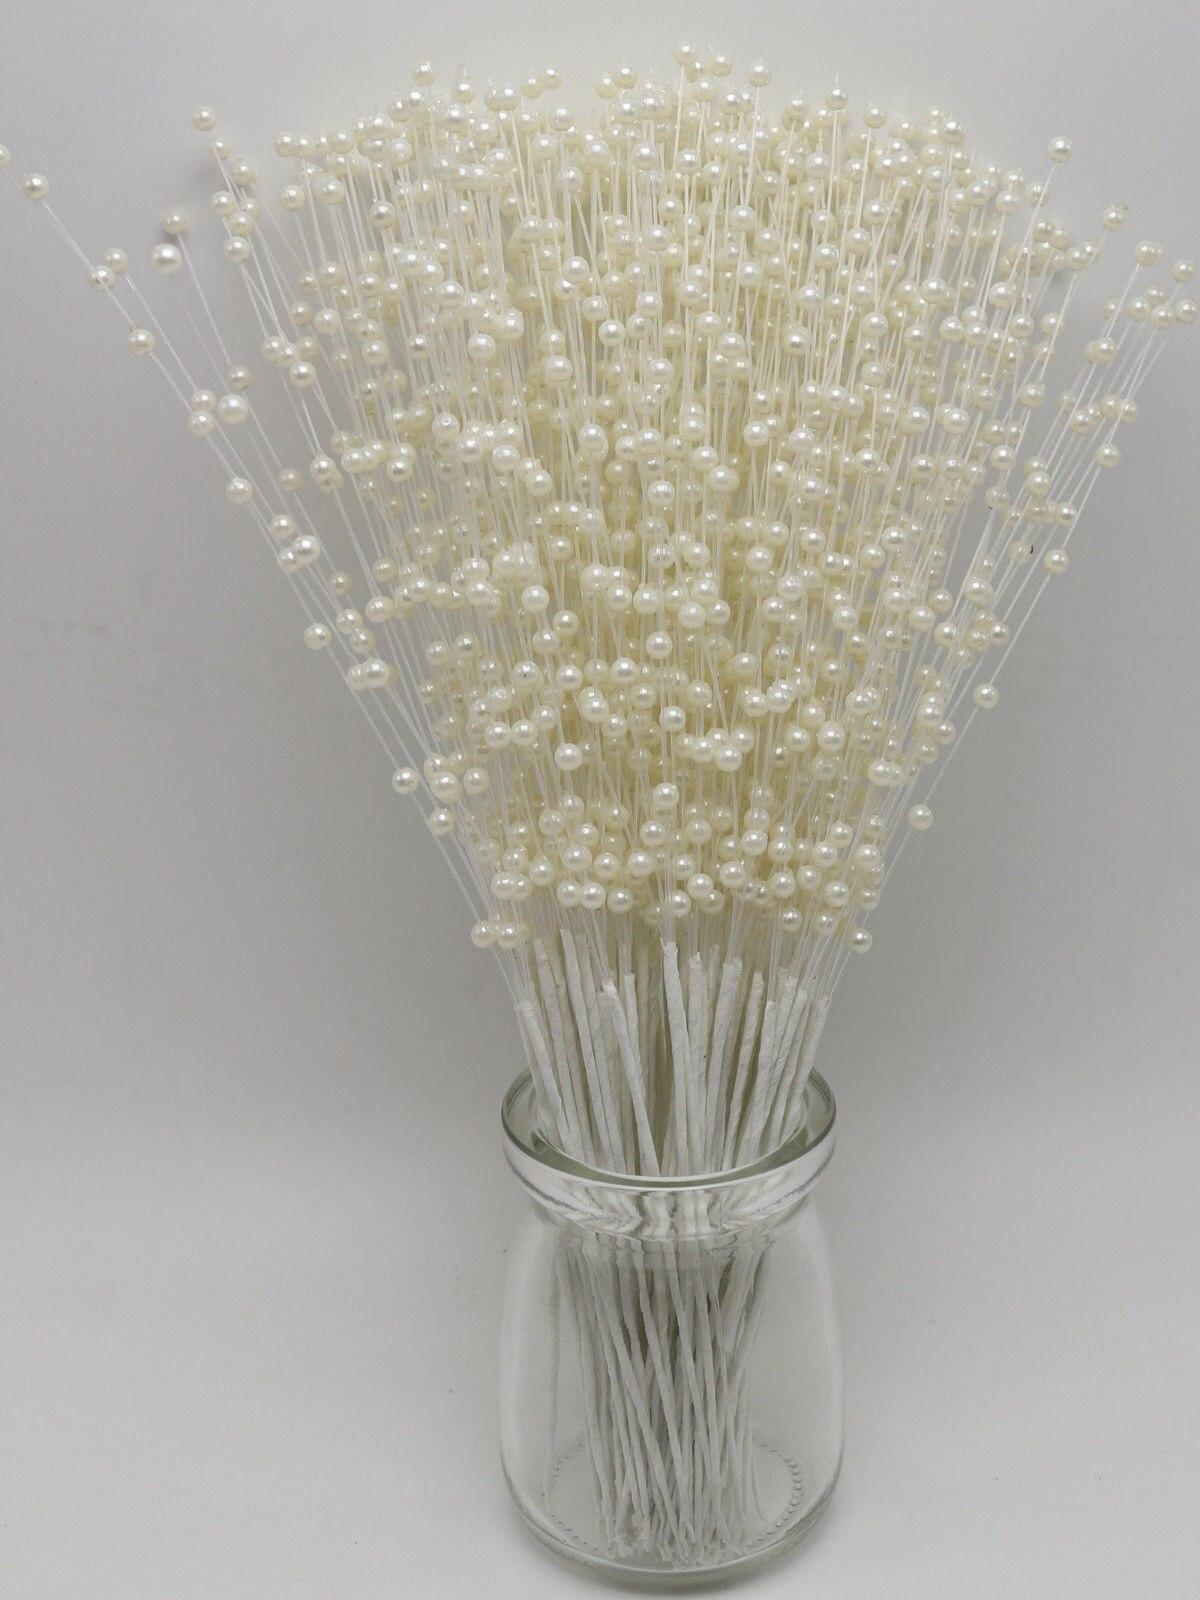 Ivory Pearl Flower Stem Beads Garland Sprays Bridal Bouquet Wedding Party Decor